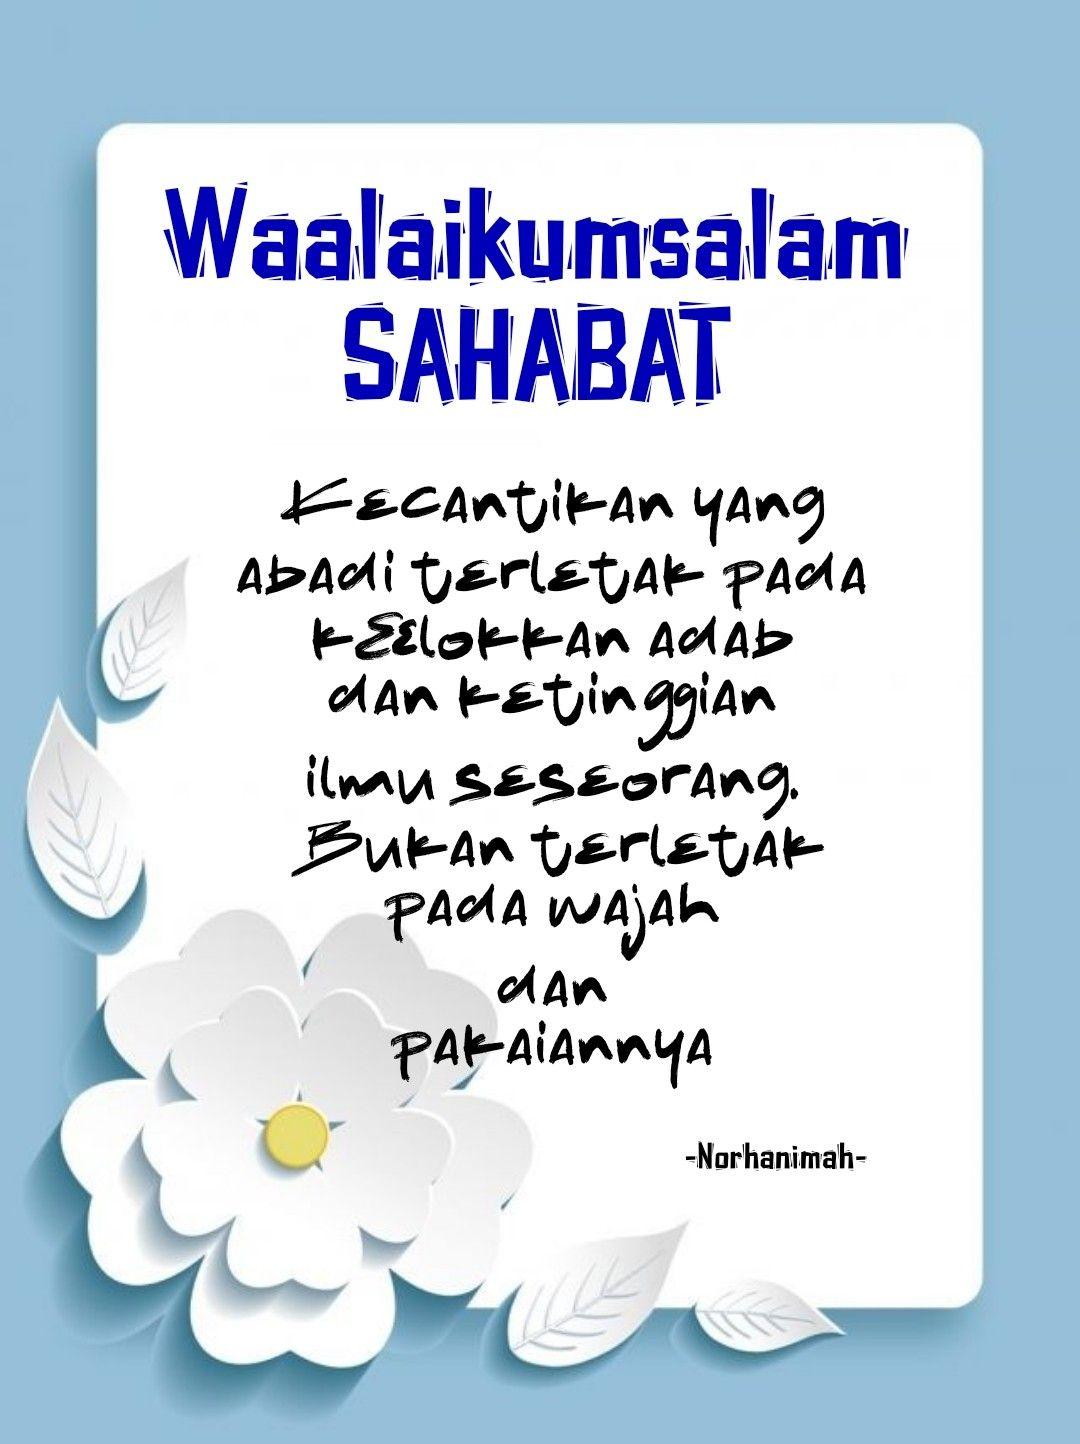 Tulisan Waalaikumsalam Warahmatullahi Wabarakatuh : tulisan, waalaikumsalam, warahmatullahi, wabarakatuh, Tulisan, Waalaikumsalam